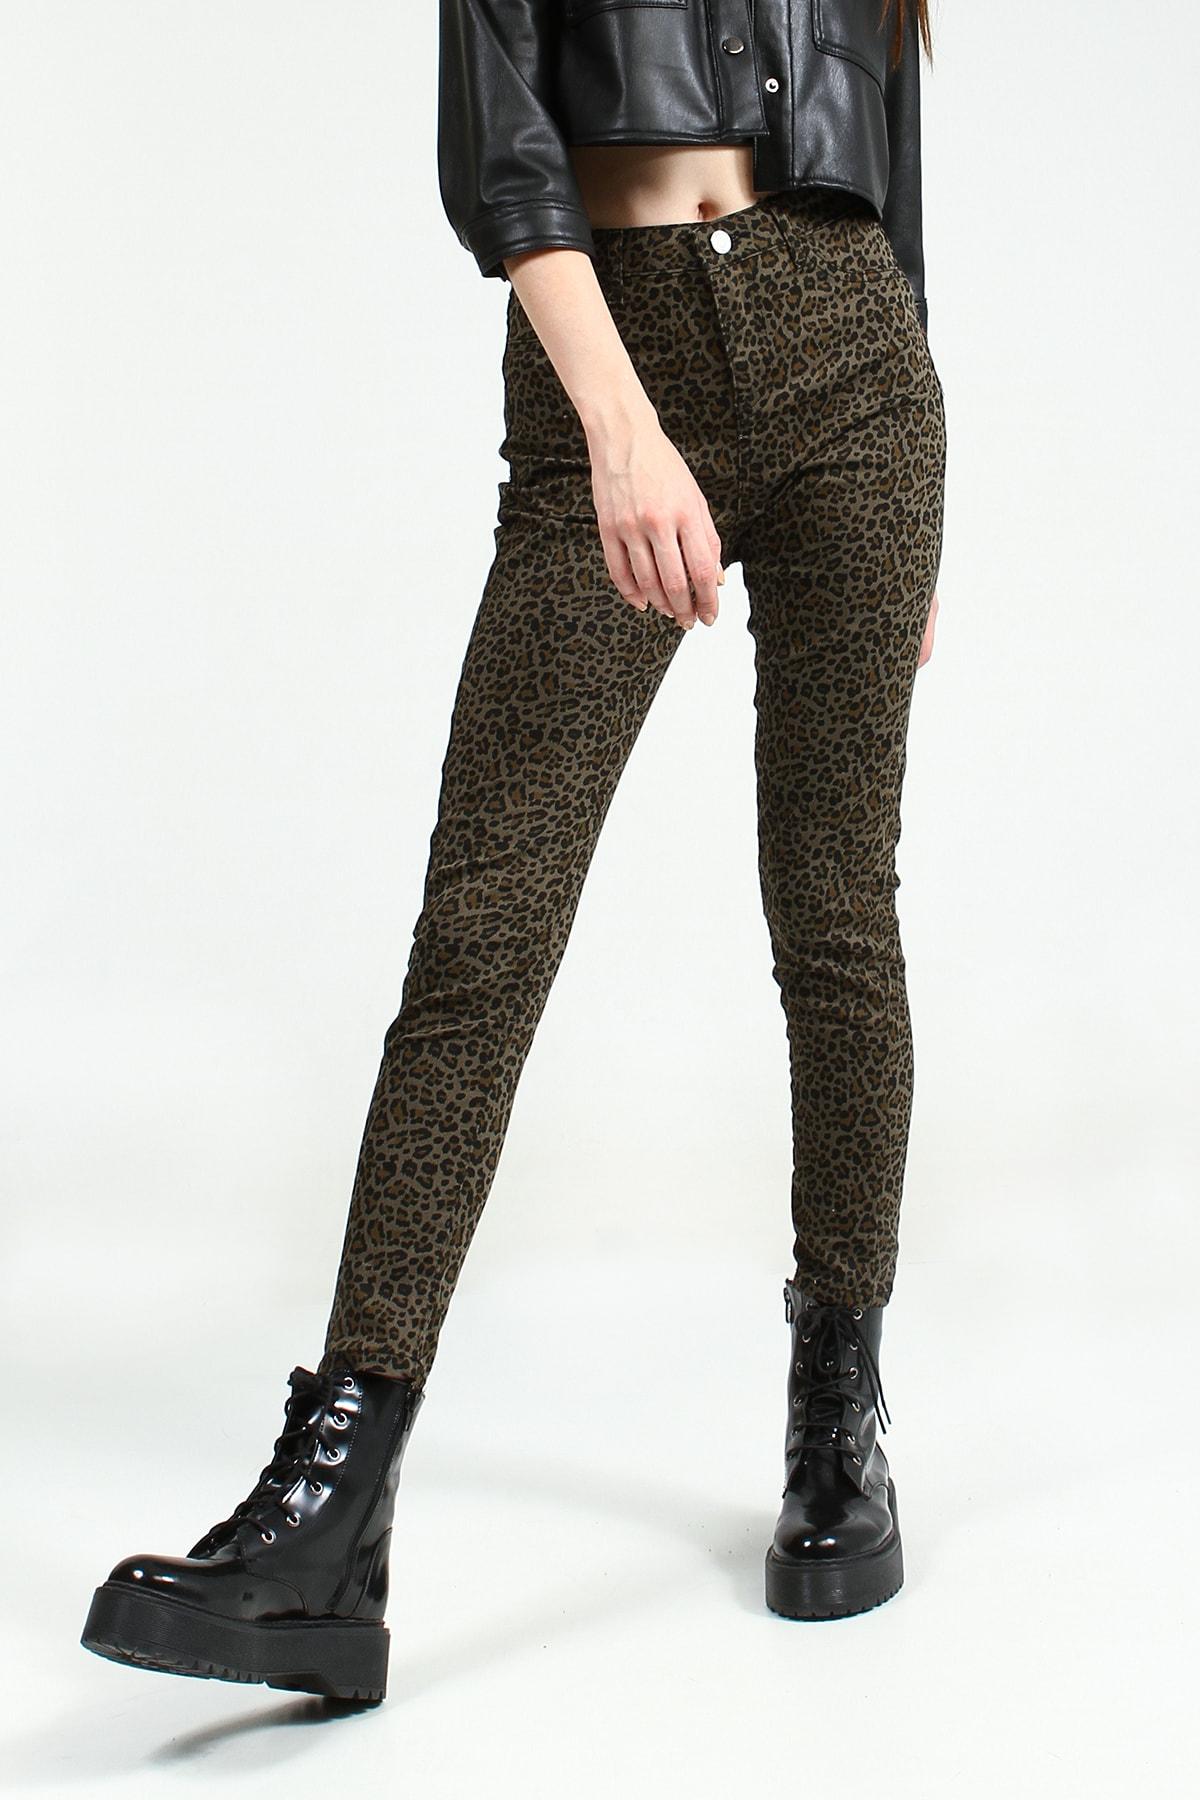 Collezione Kadın Haki Skinny Pantolon Sersiya Ucb021845A44 UCB021845A44 2